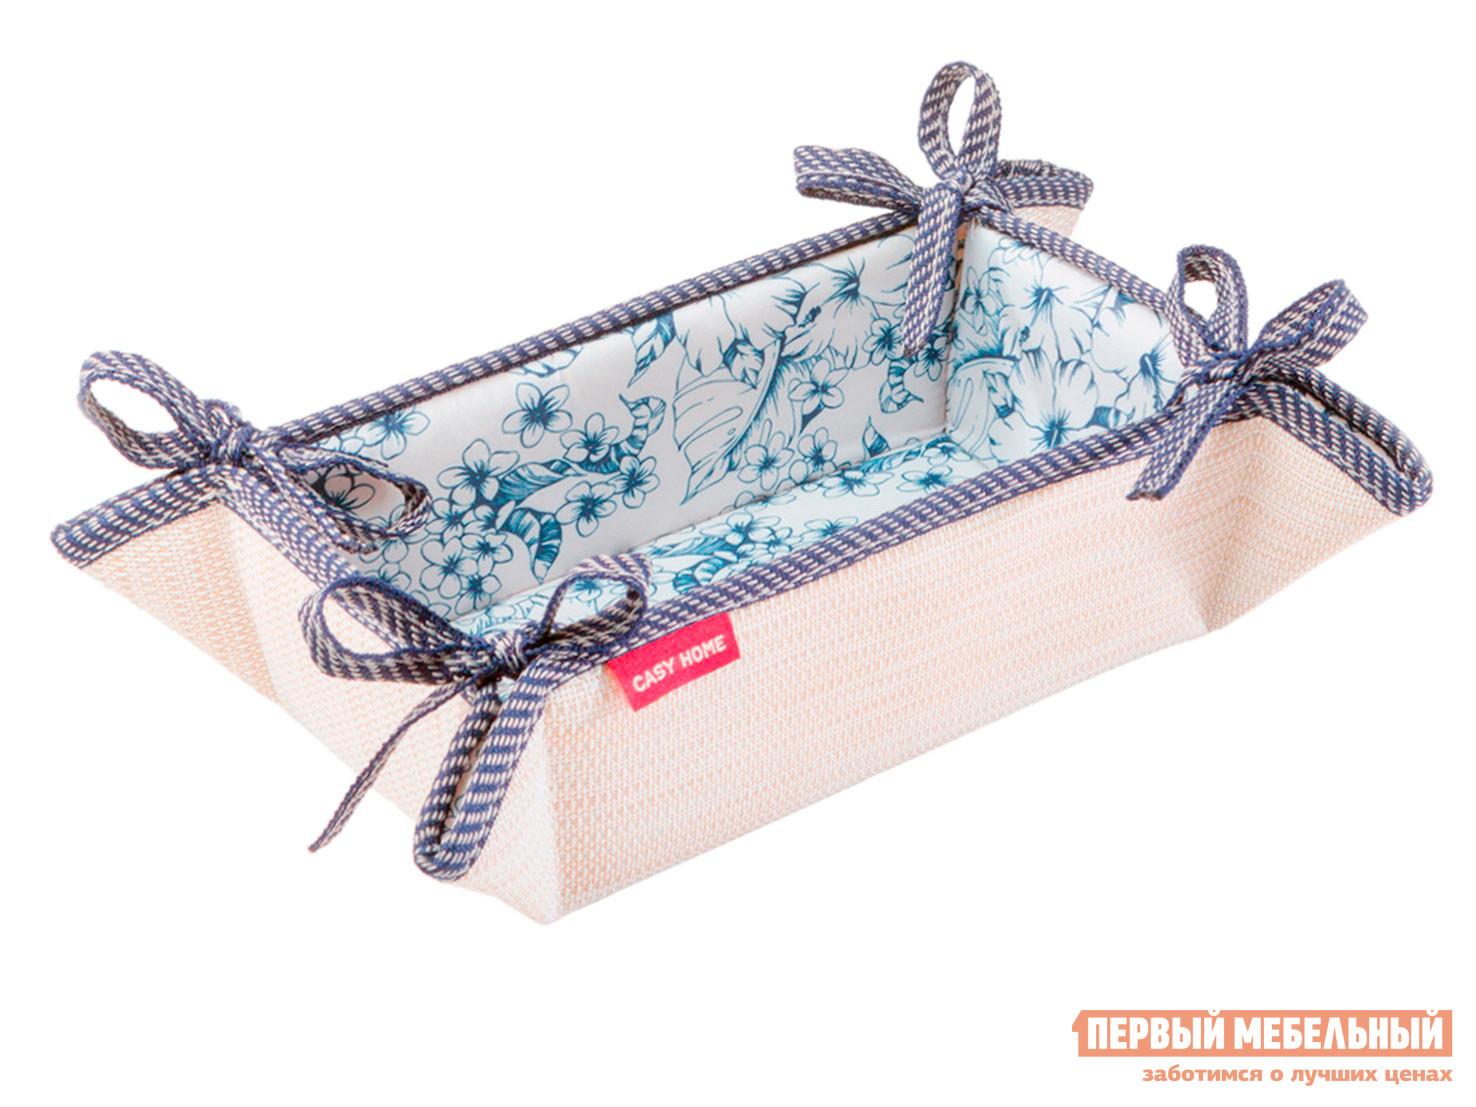 Аксессуары для сервировки и хранения Хлебница 20х13х7см Бежевый, текстилен / Синий, цветы фото